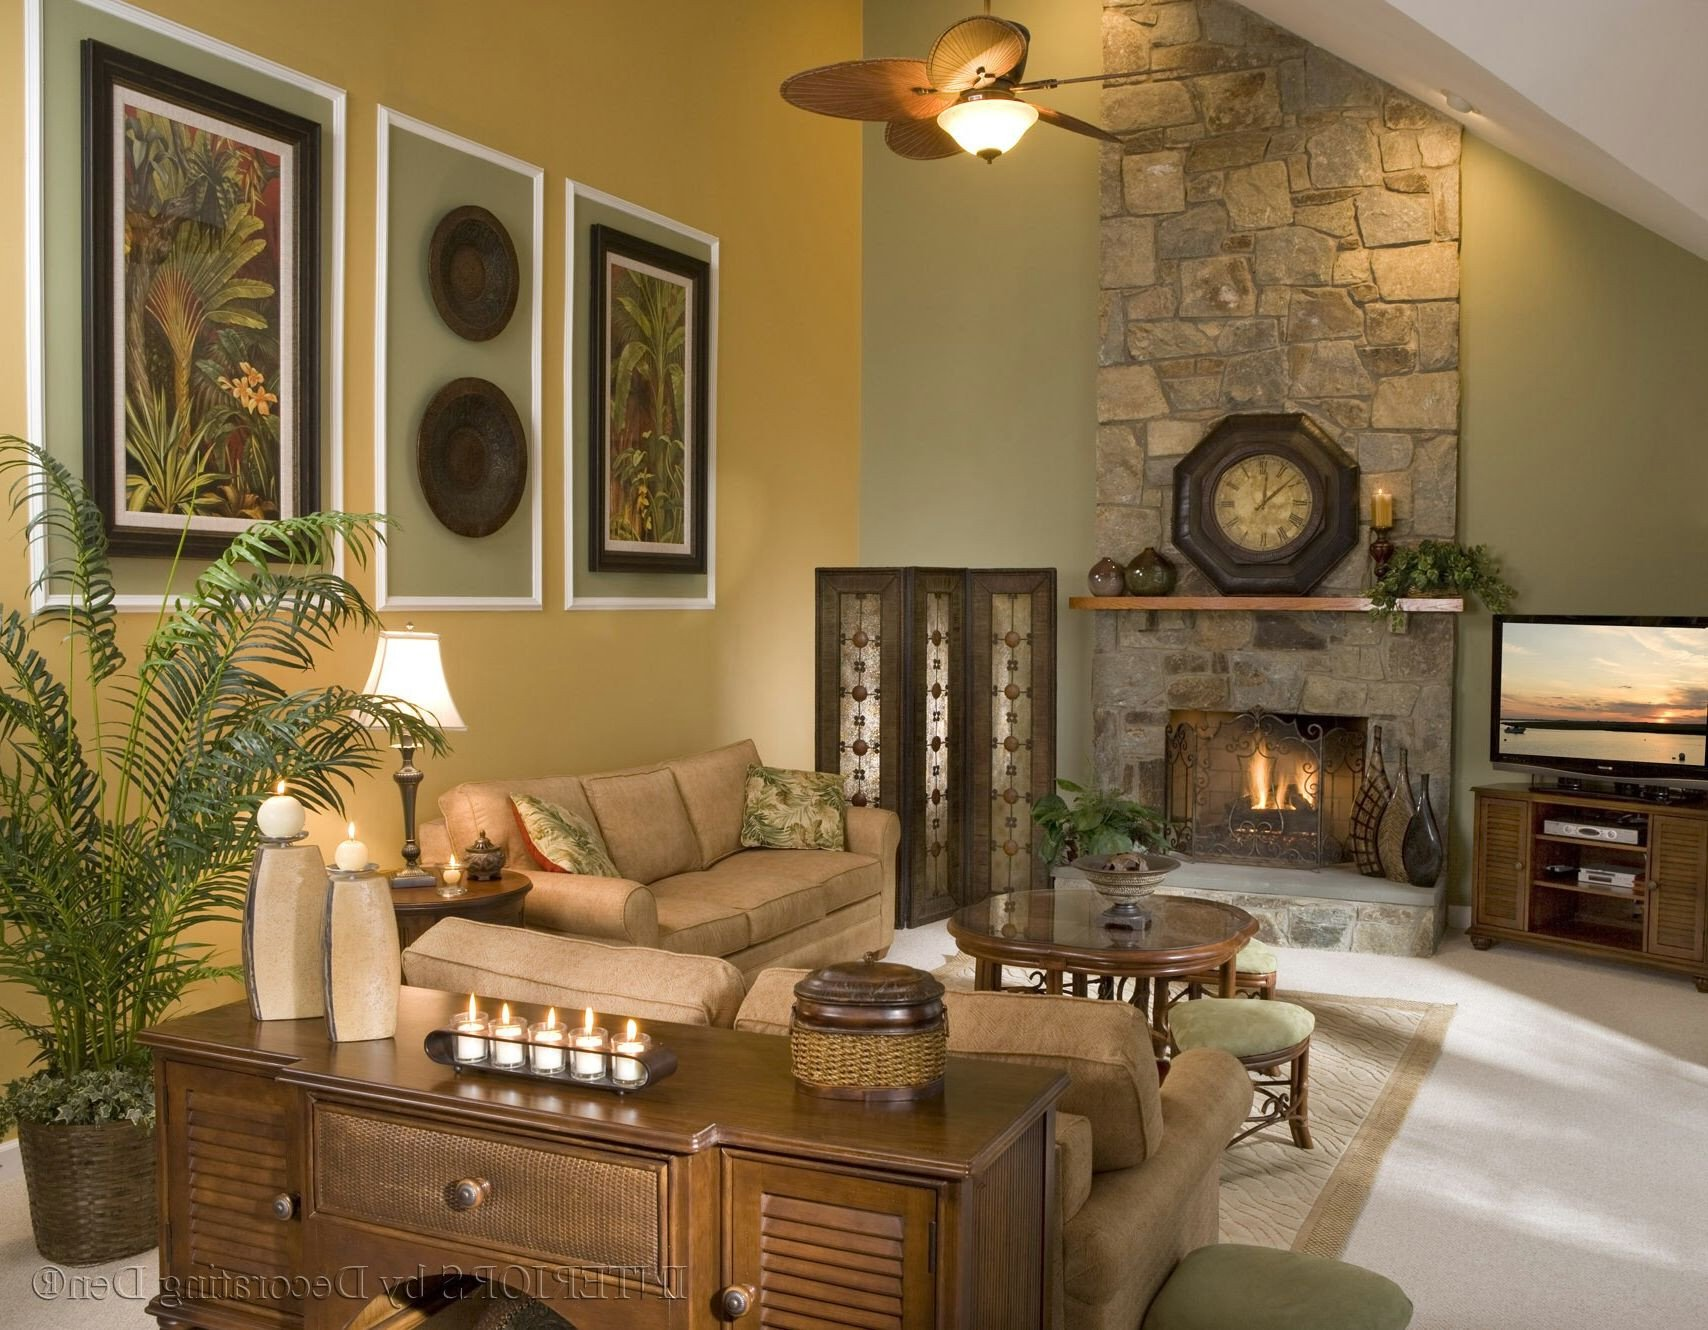 Living Room Wall Decorating Ideas Luxury 38 Wall Decorating Ideas for Family Room Living Room Wall Decoration Ideas